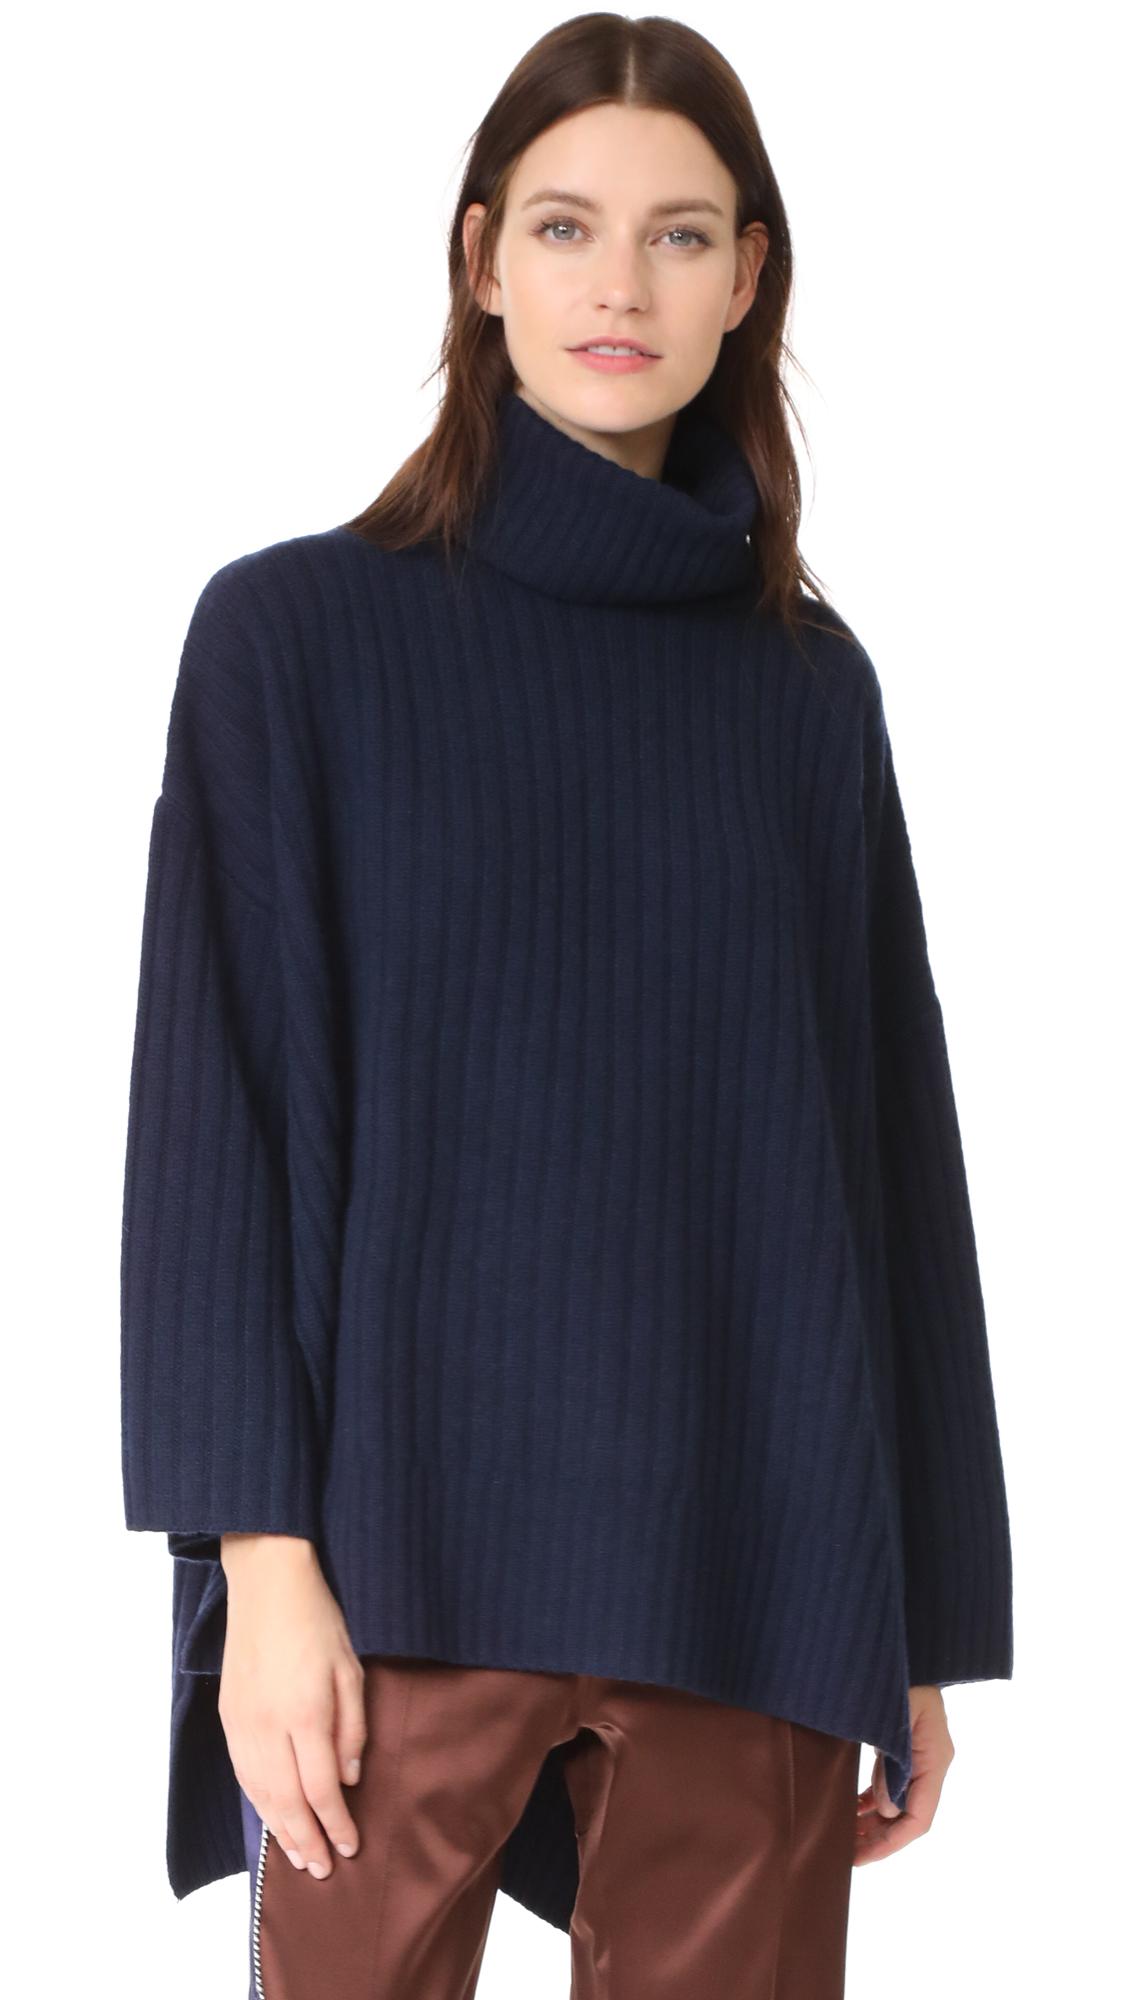 Joseph Sweater - Navy